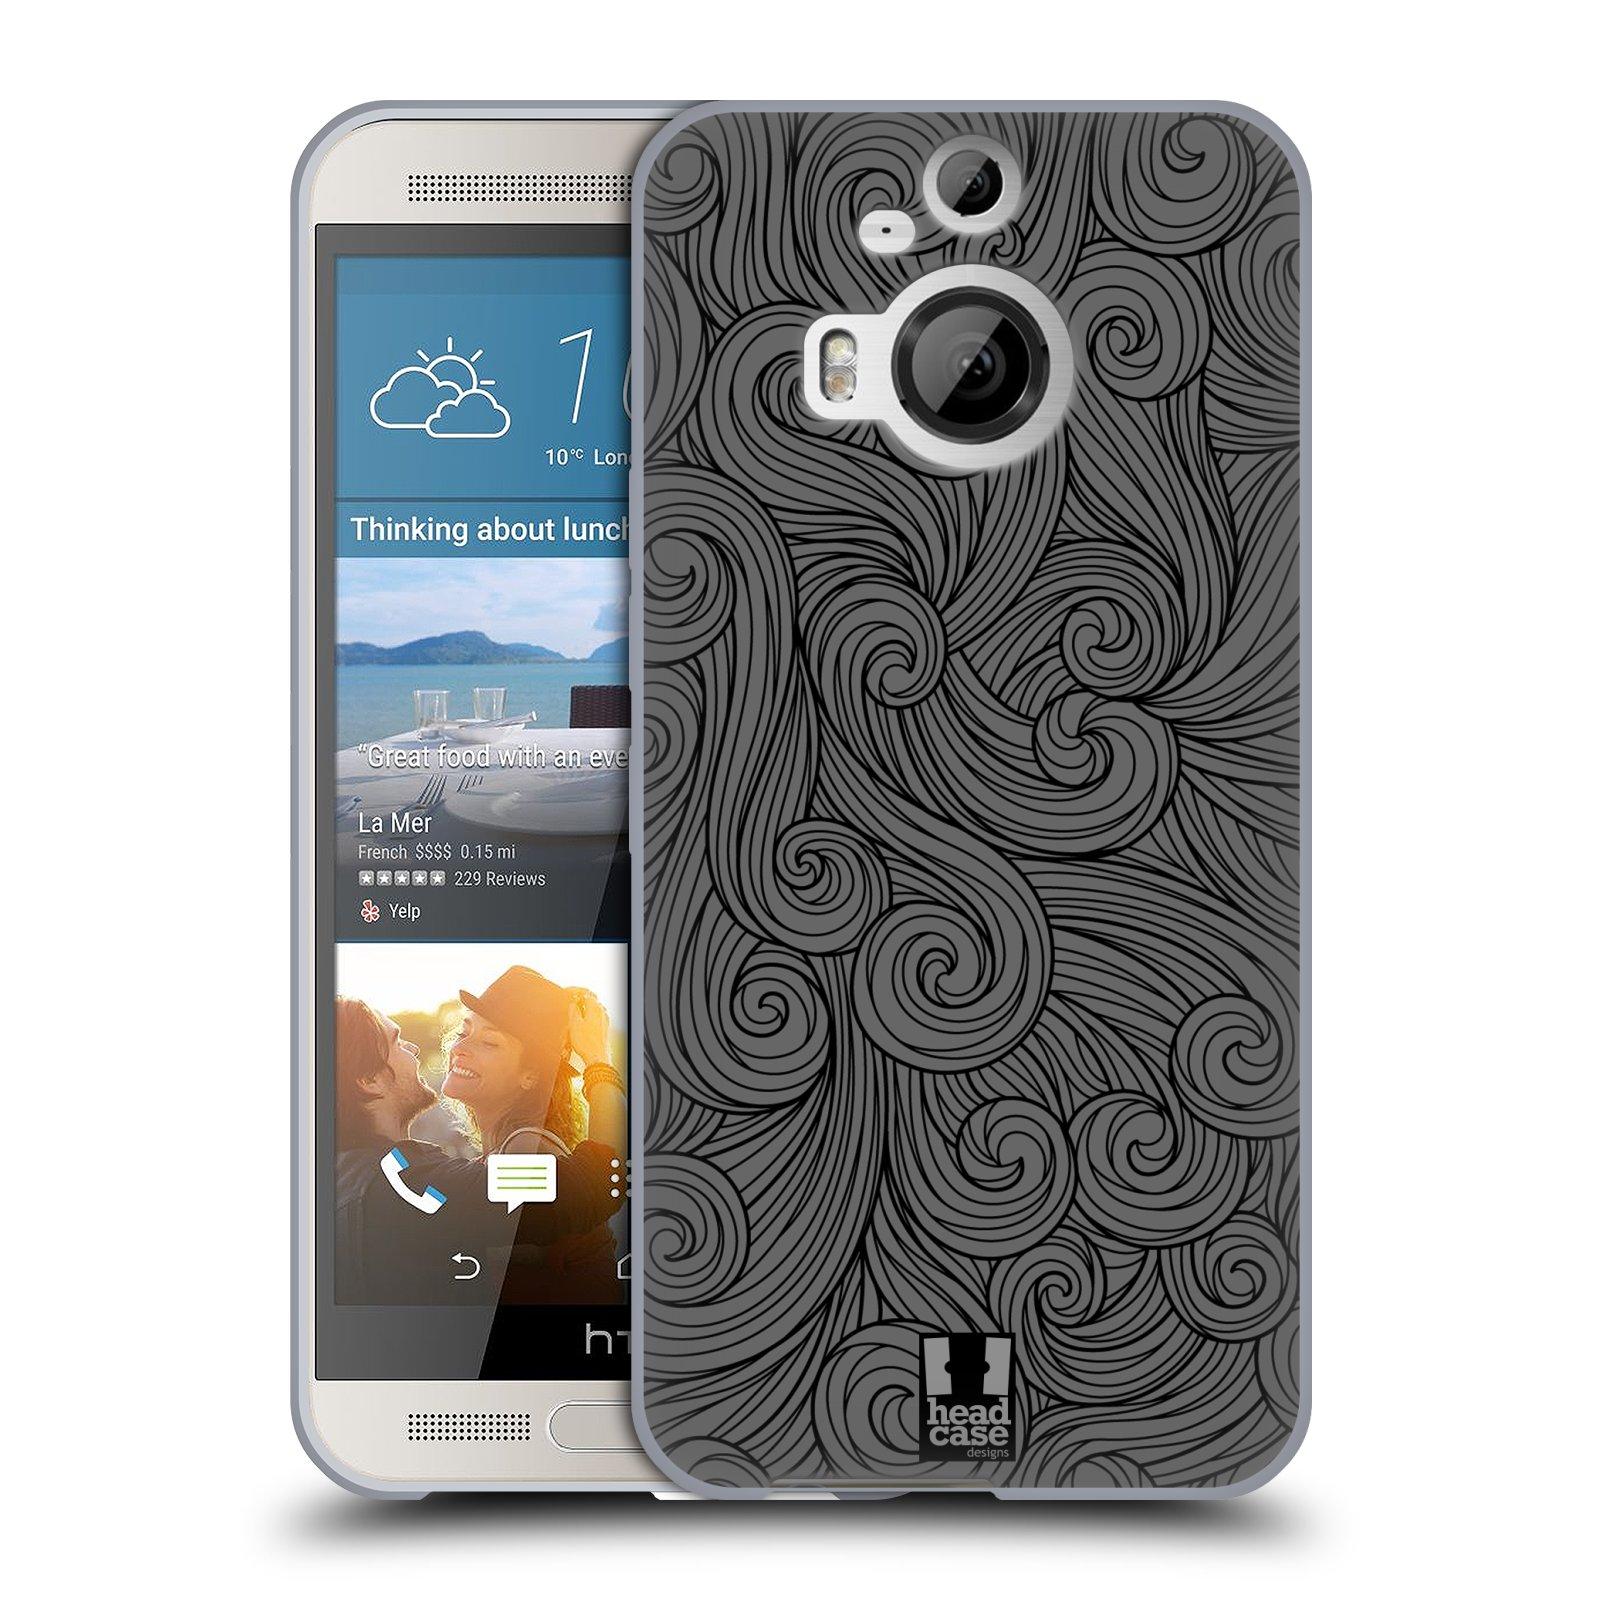 Silikonové pouzdro na mobil HTC One M9+ (Plus) HEAD CASE Dark Grey Swirls (Silikonový kryt či obal na mobilní telefon HTC One M9+)